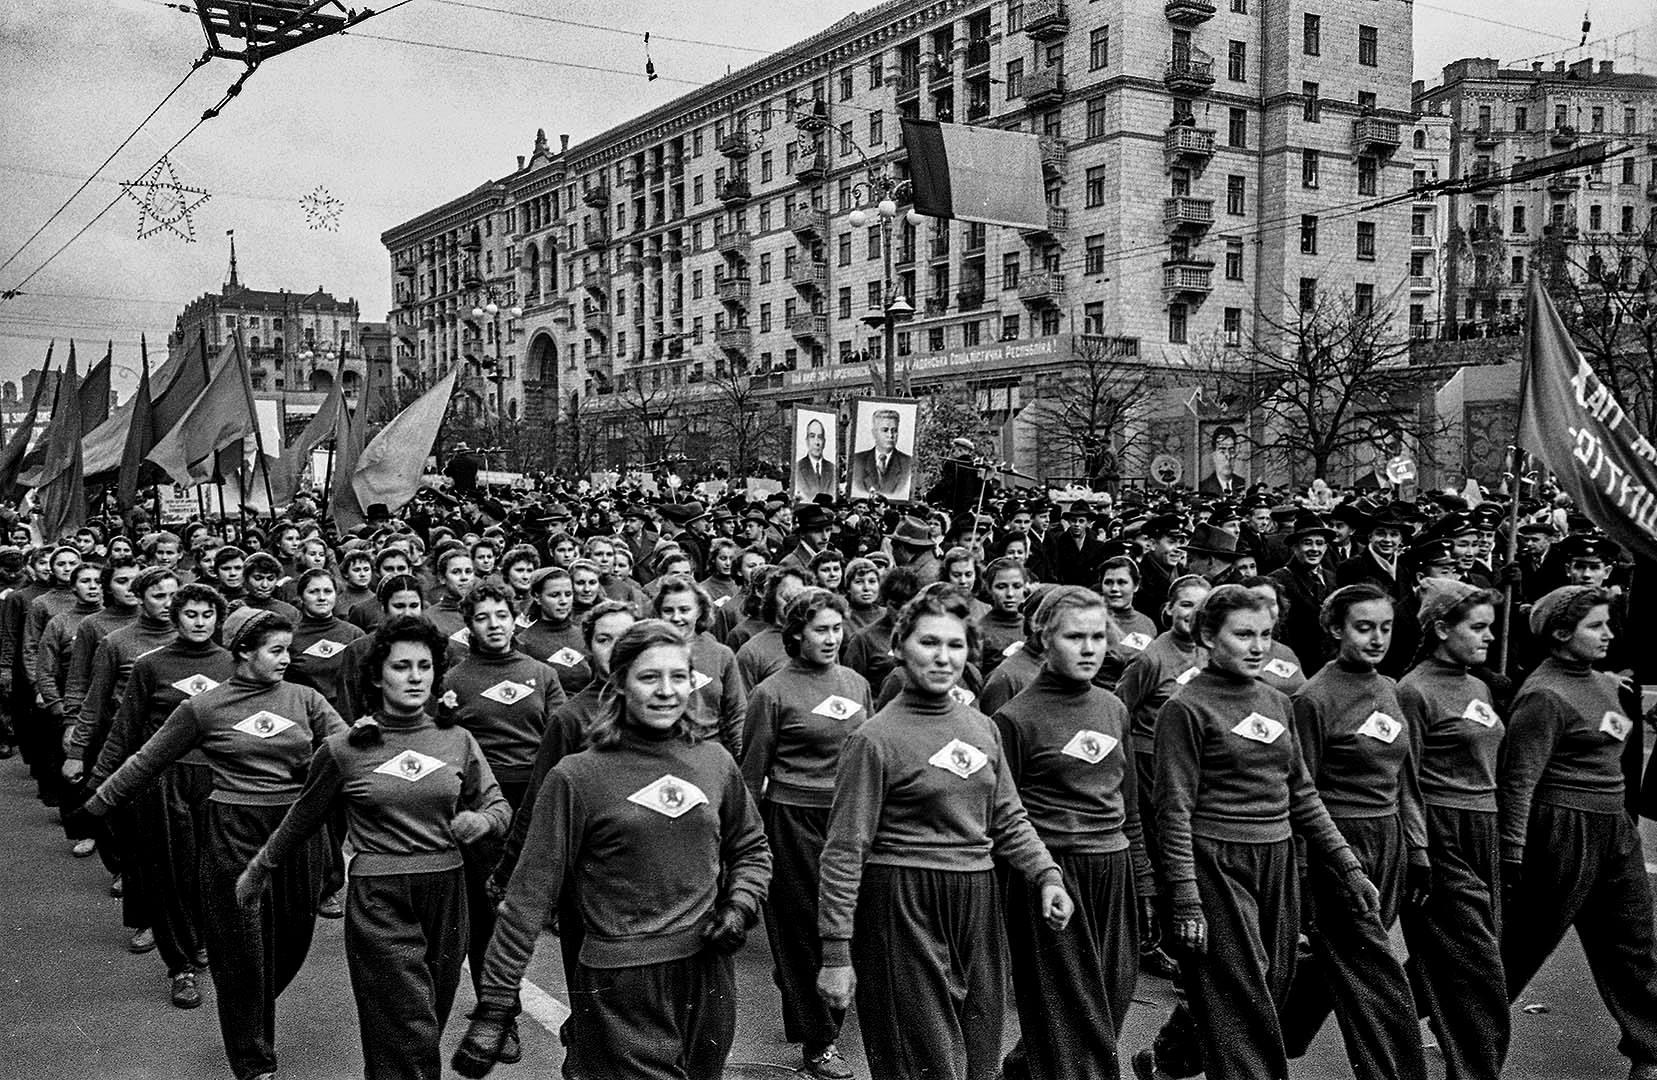 1958, Khreshchatyk, 41th anniversary of the October revolution by Iryna Pap - SEE KYIV